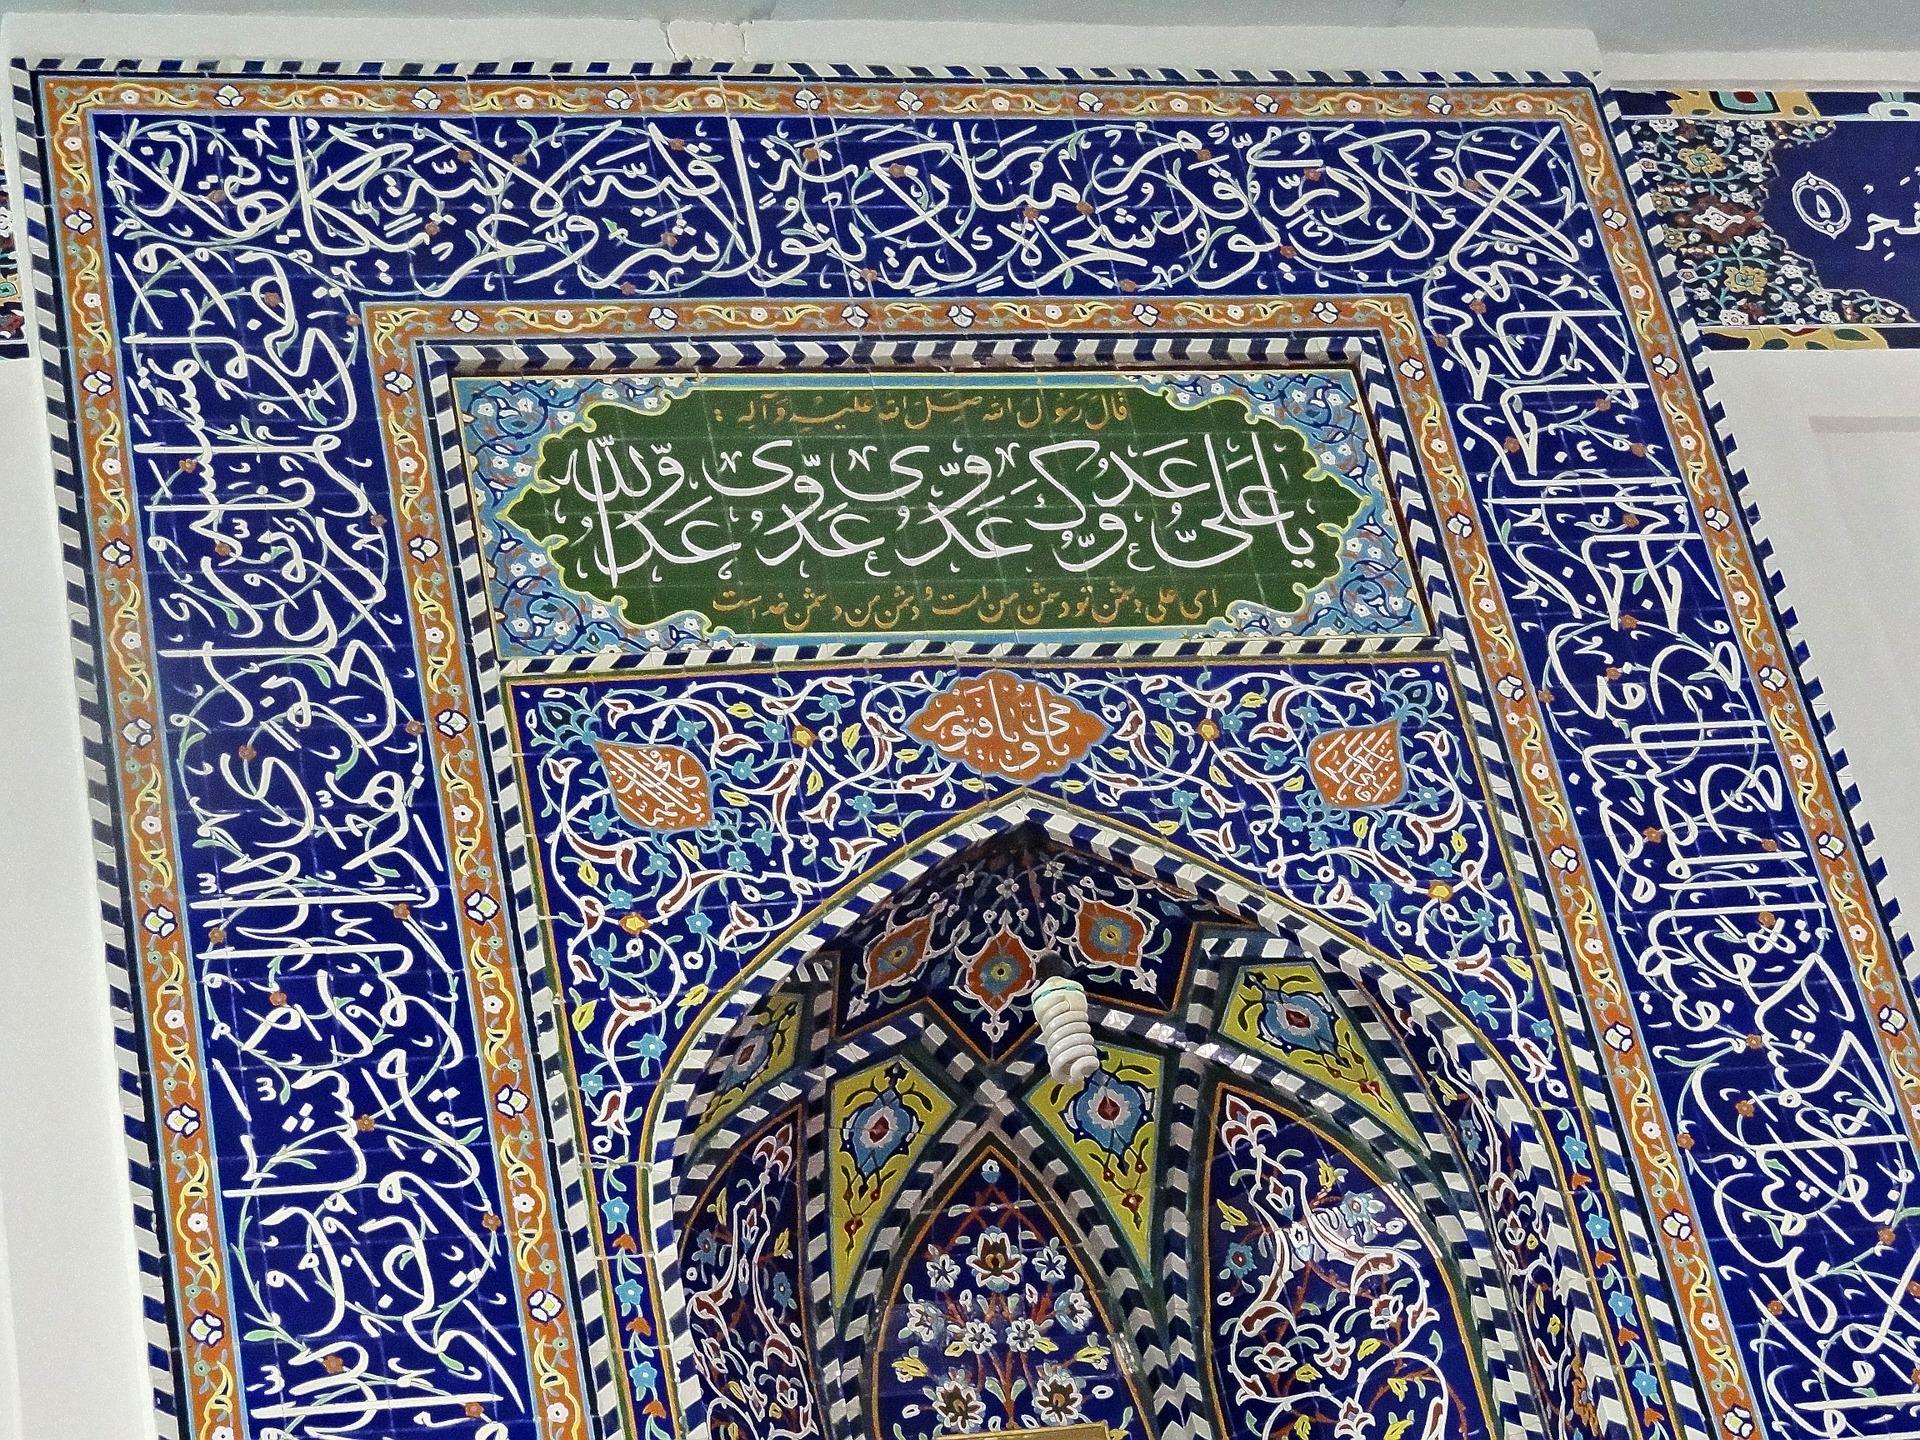 The Islamic holiday of Mawlid-al-Nabi celebrates the Prophet Muhammad's Birthday